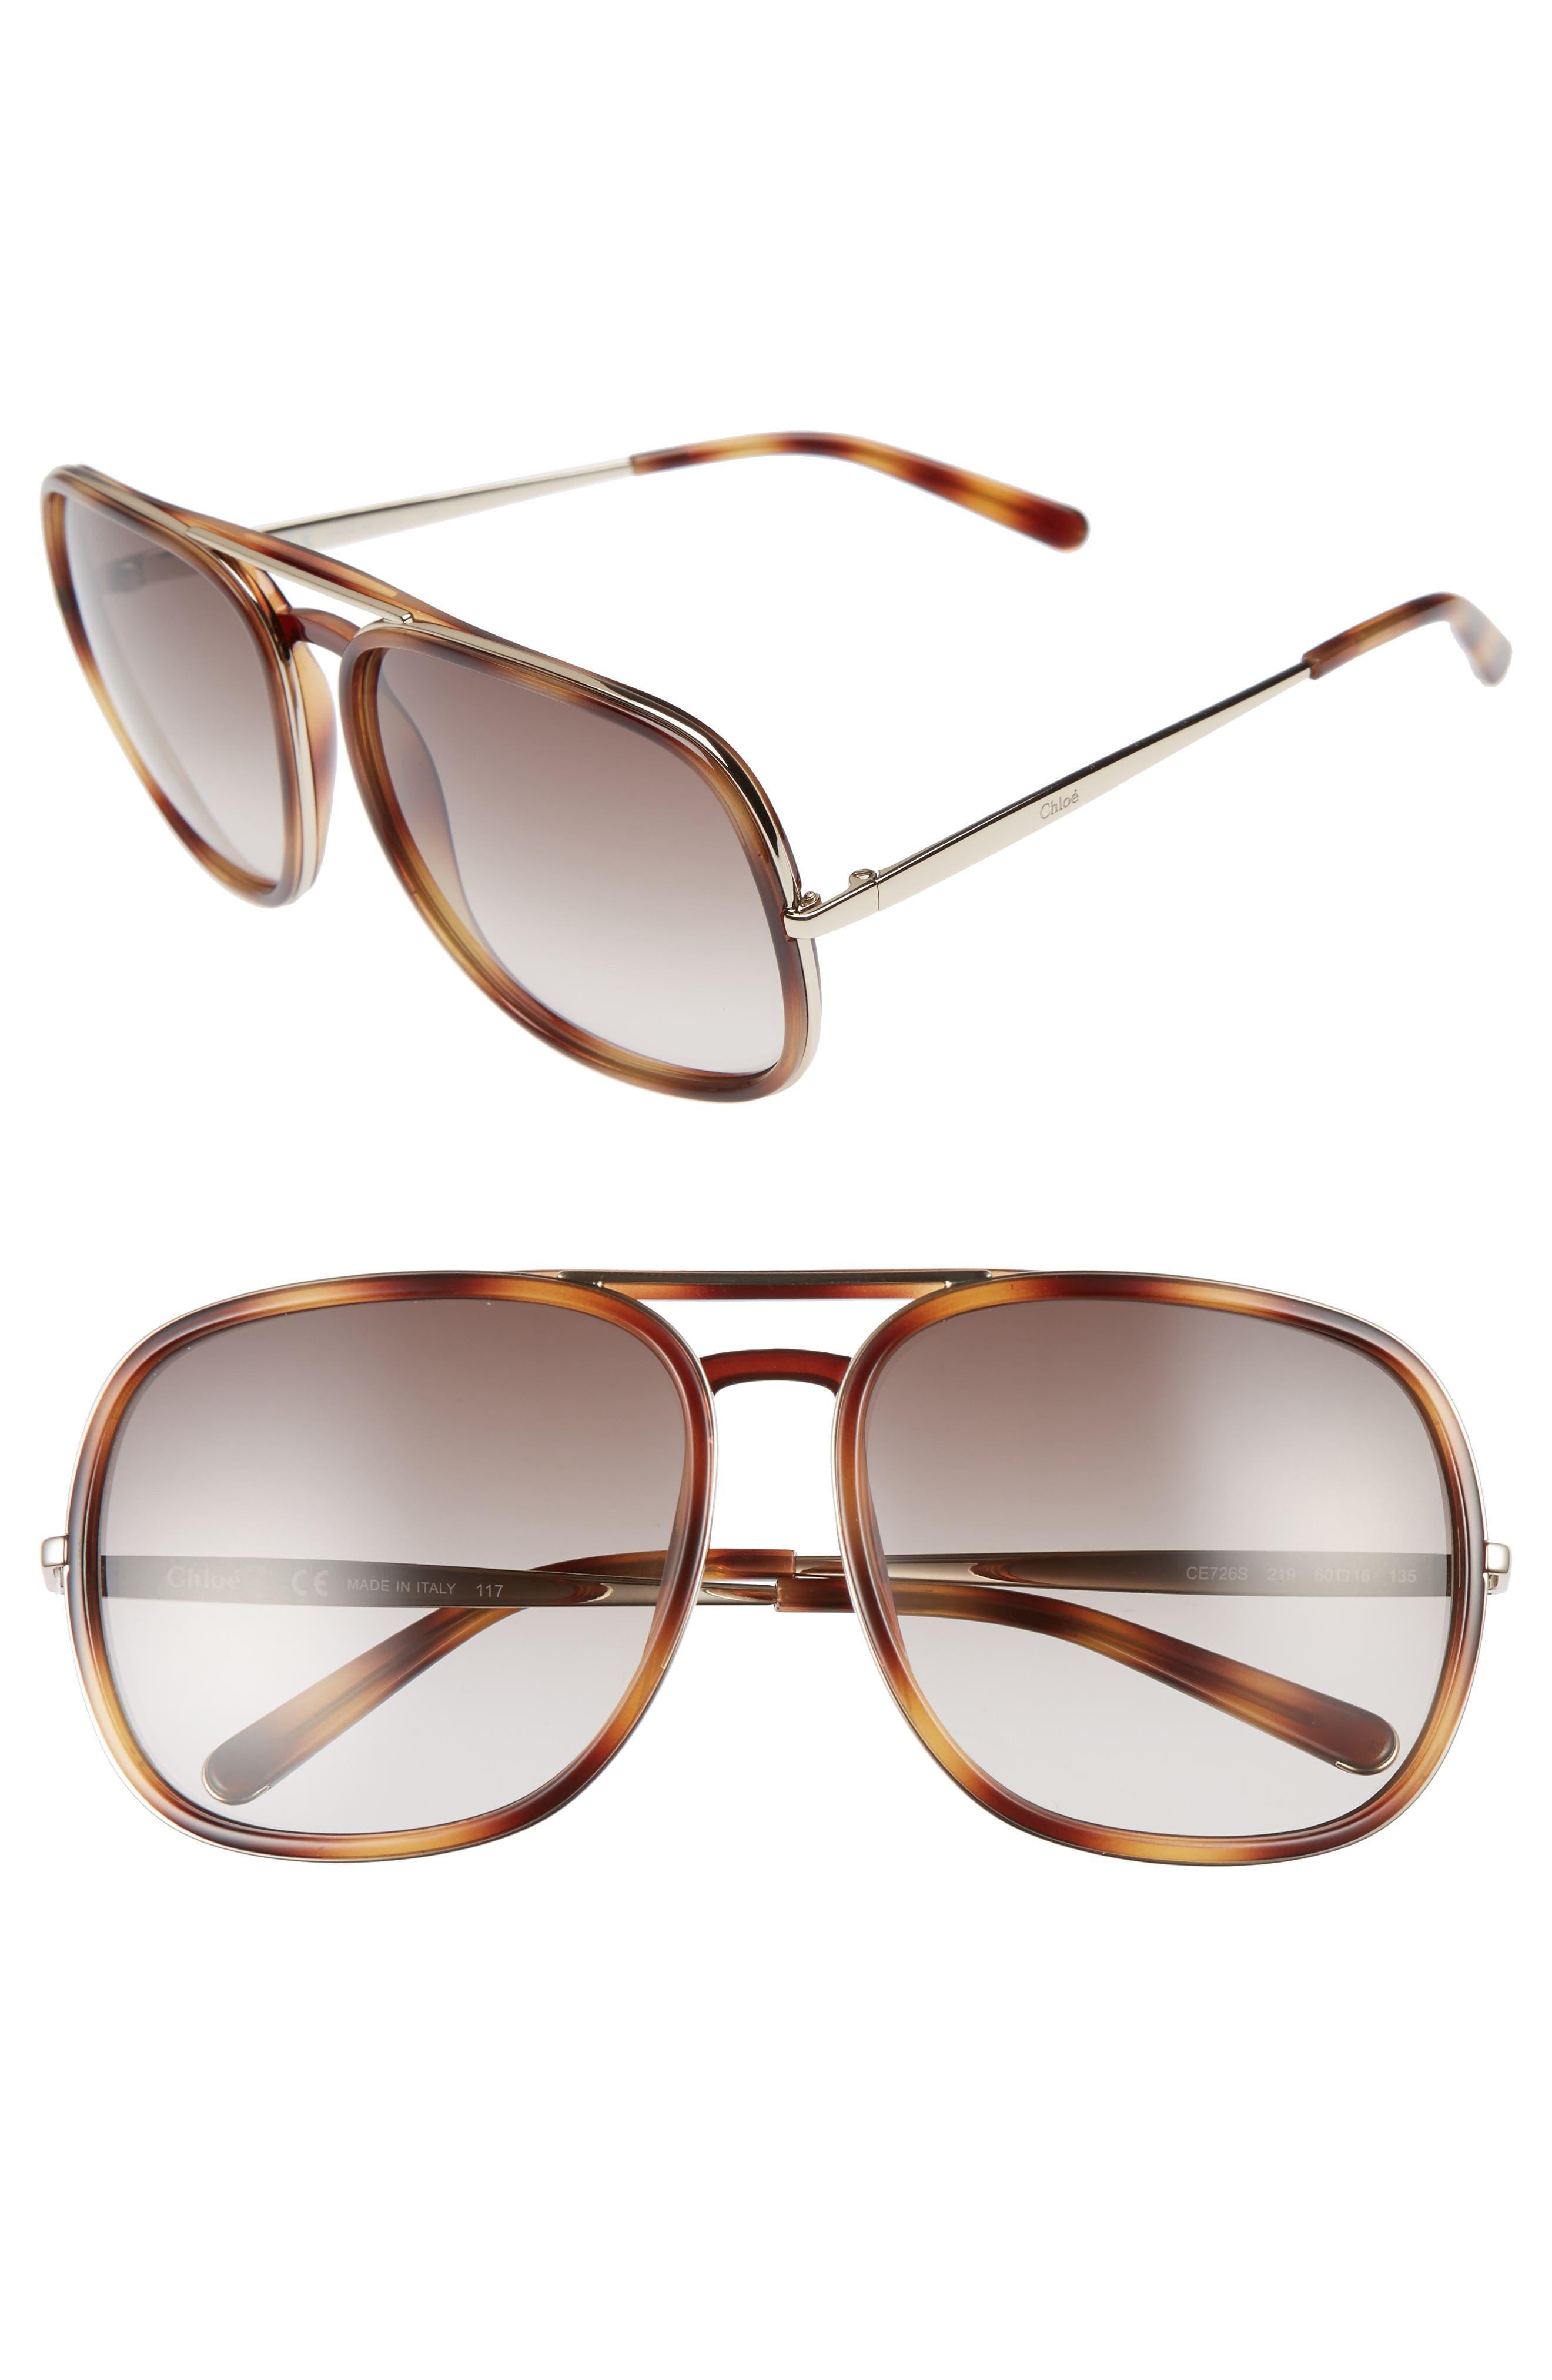 60mm Gradient Lens Navigator Sunglasses,                             Main thumbnail 1, color,                             Tortoise